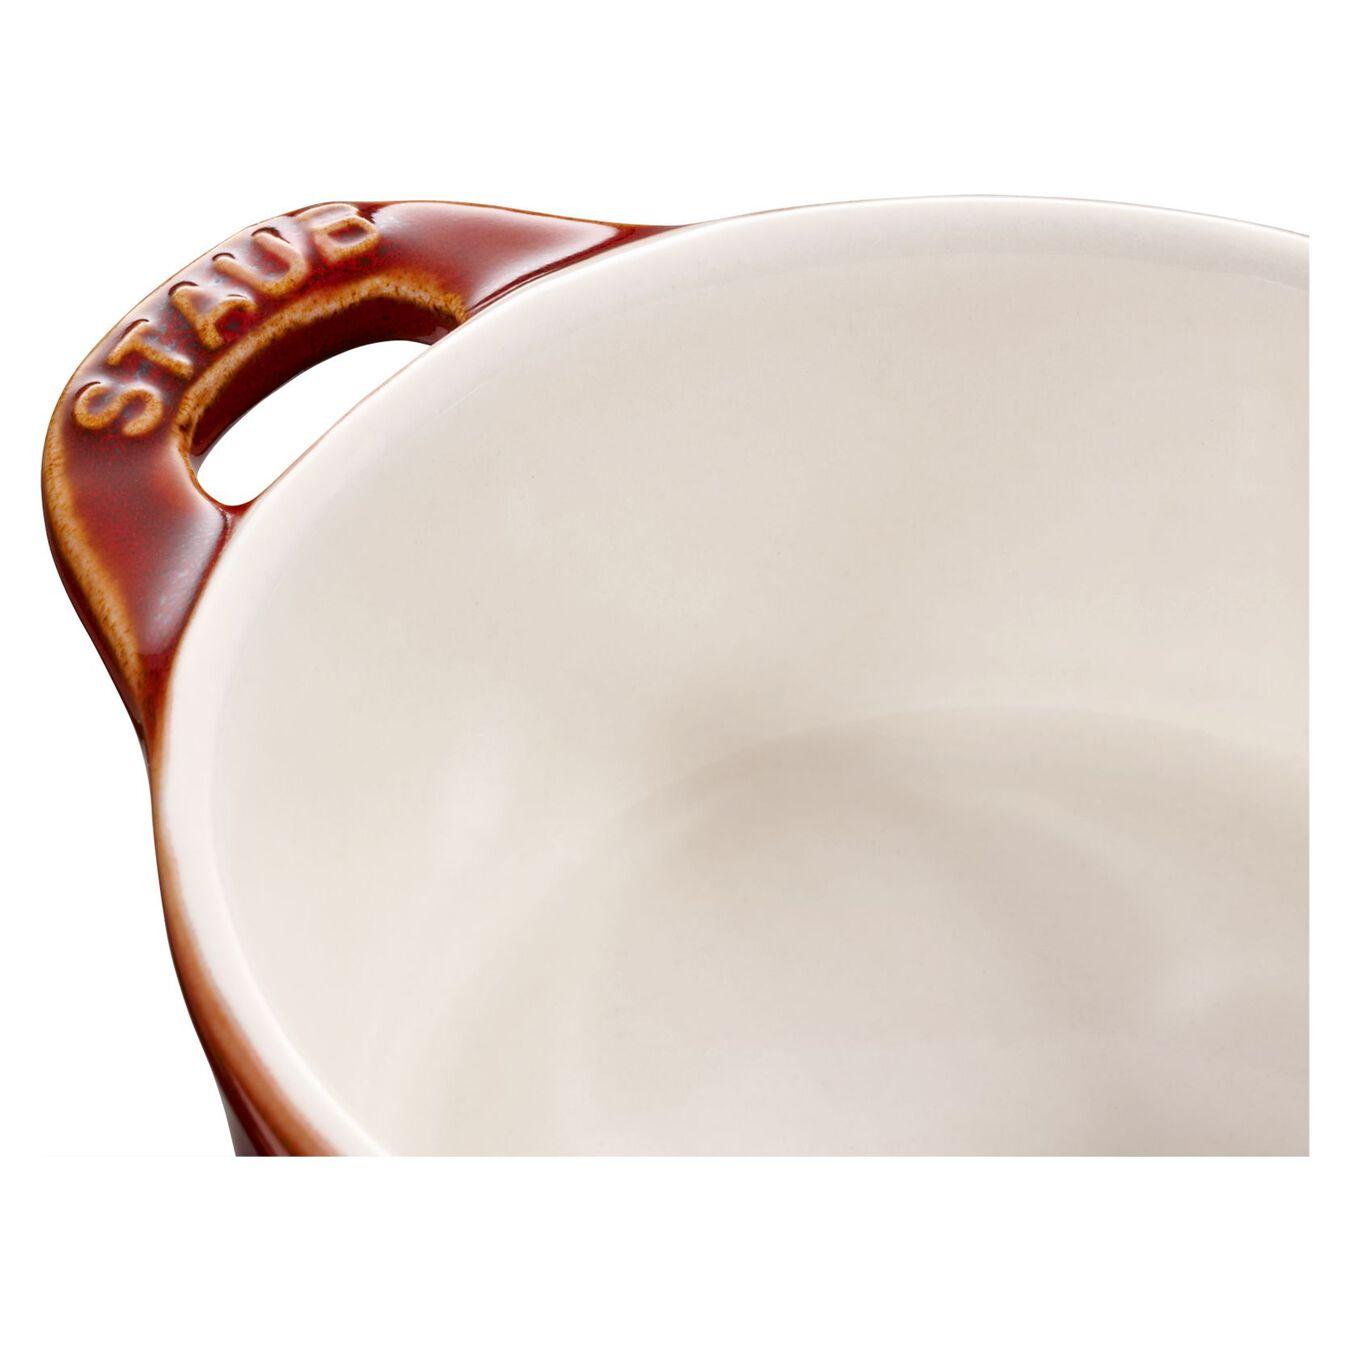 Mini cocotte rotonda - 10 cm, rame antico,,large 2